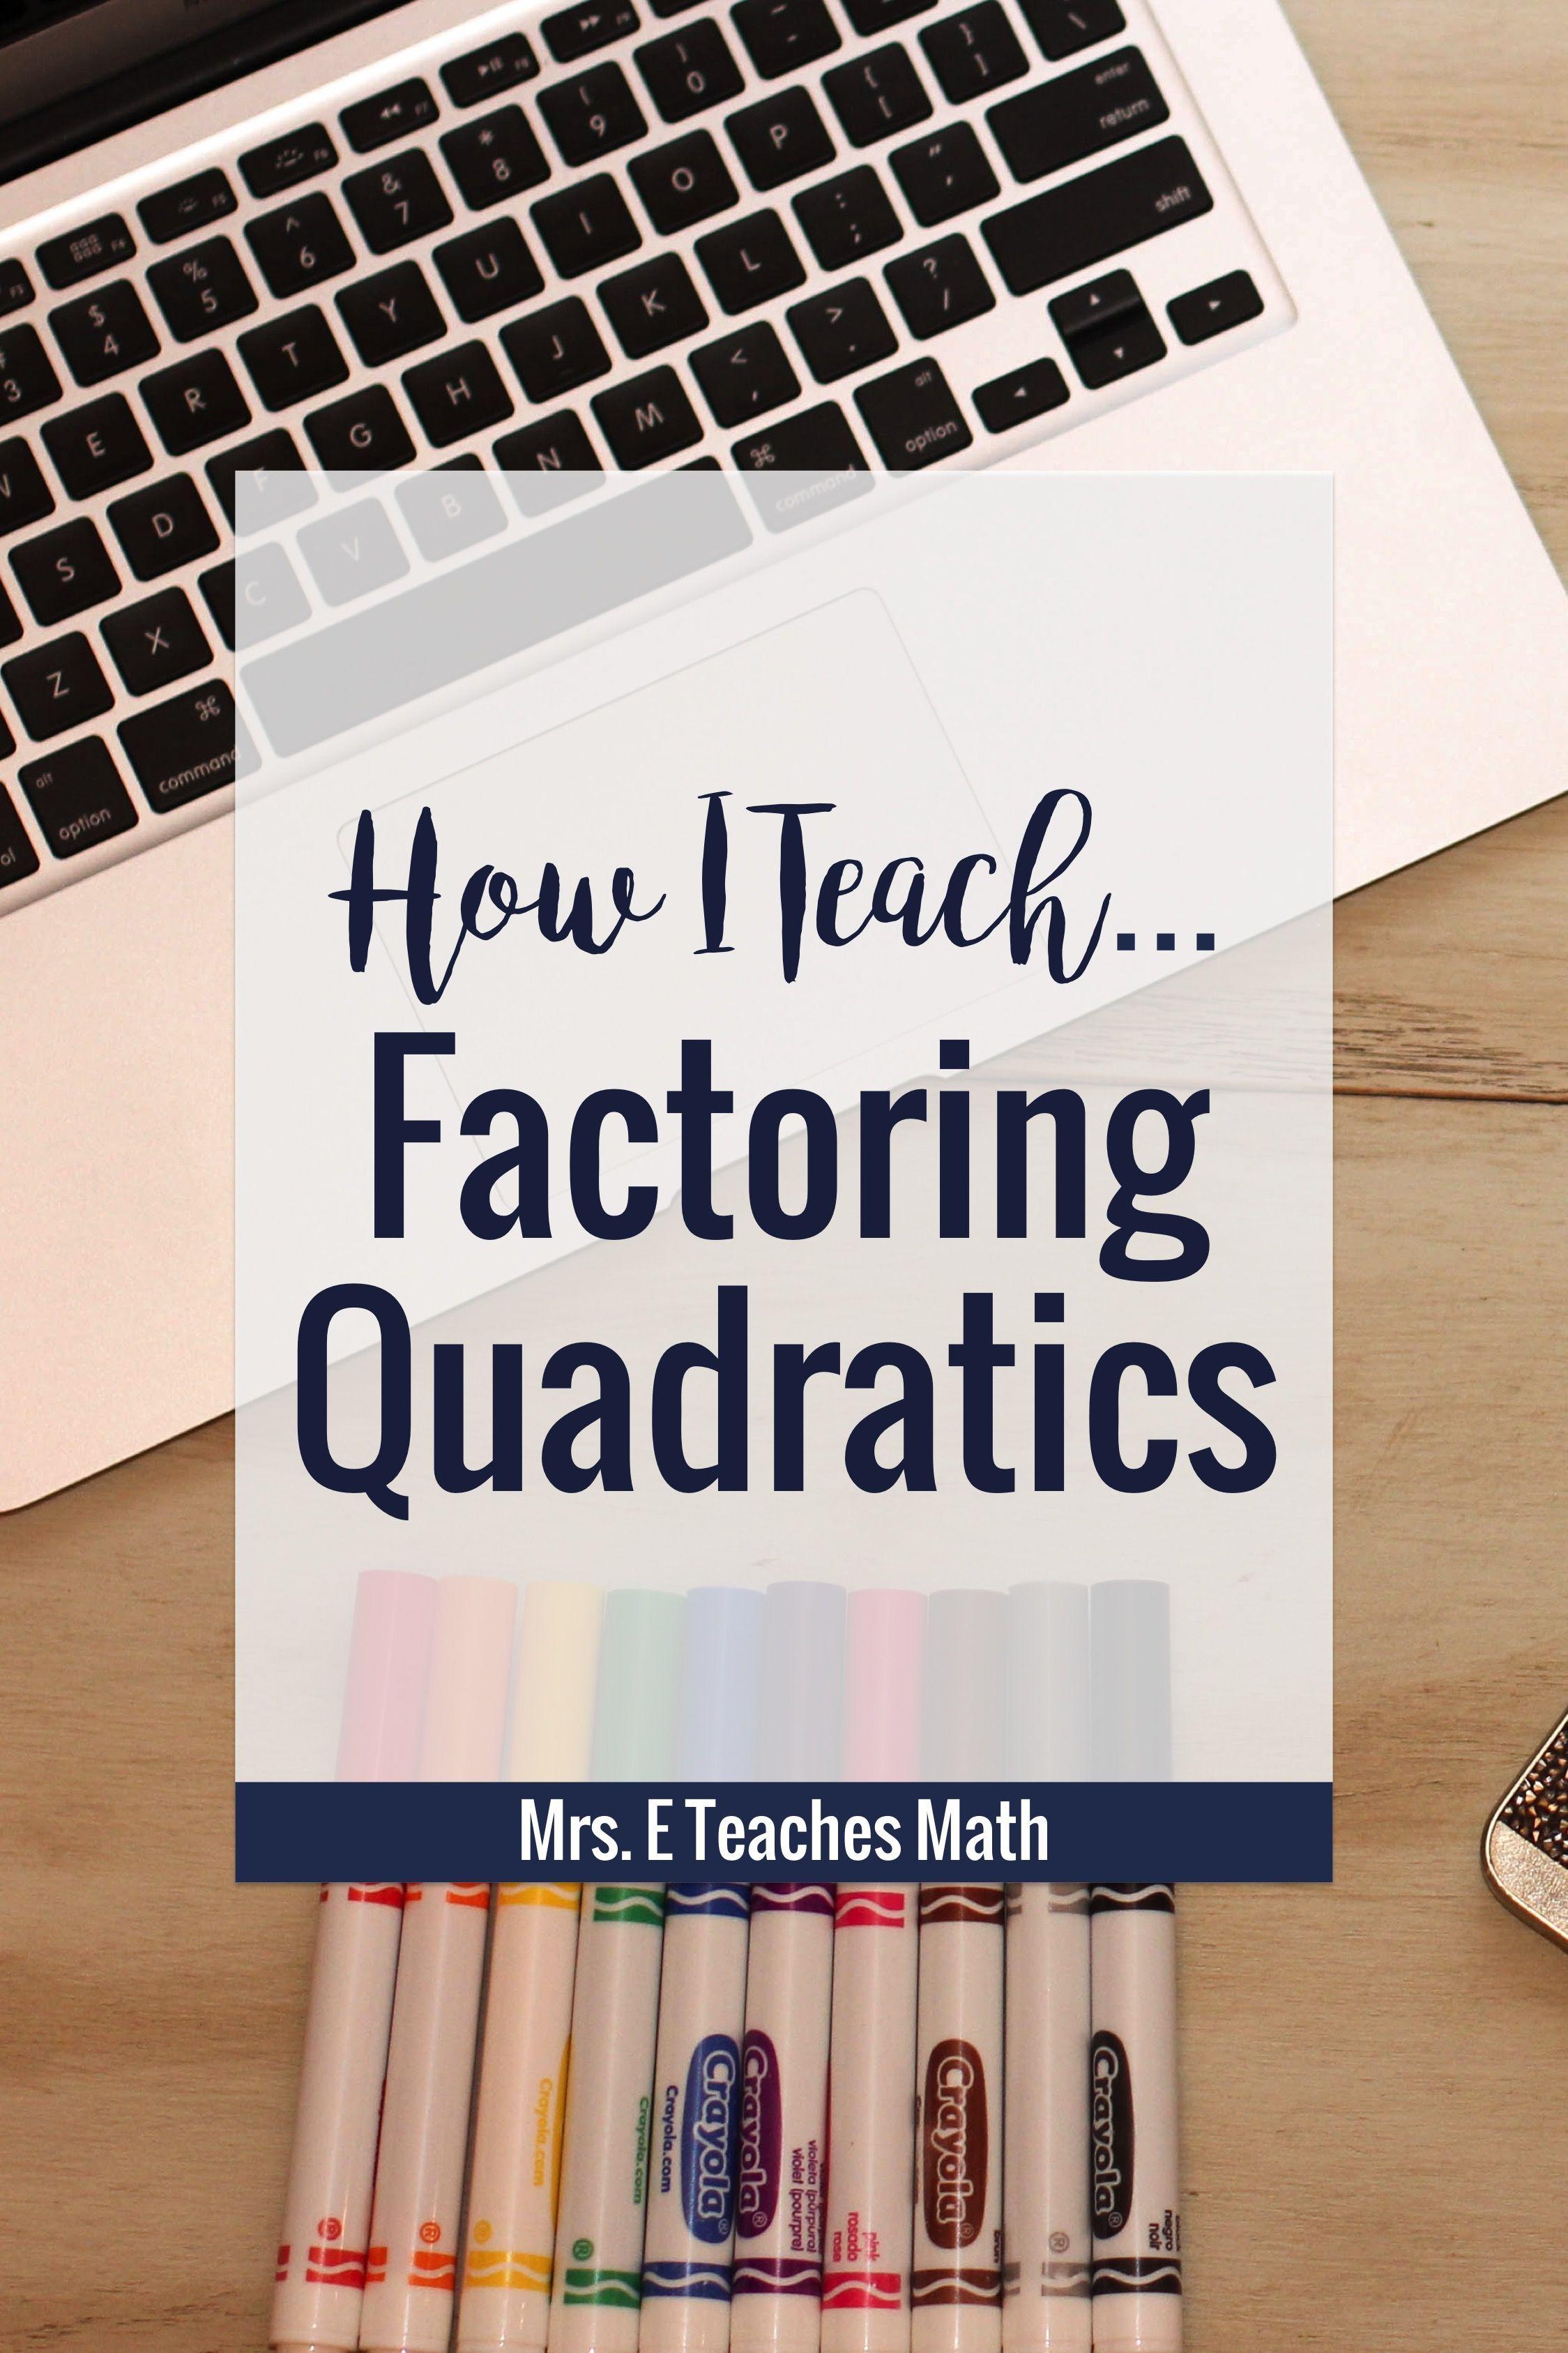 How I Teach Factoring Quadratics